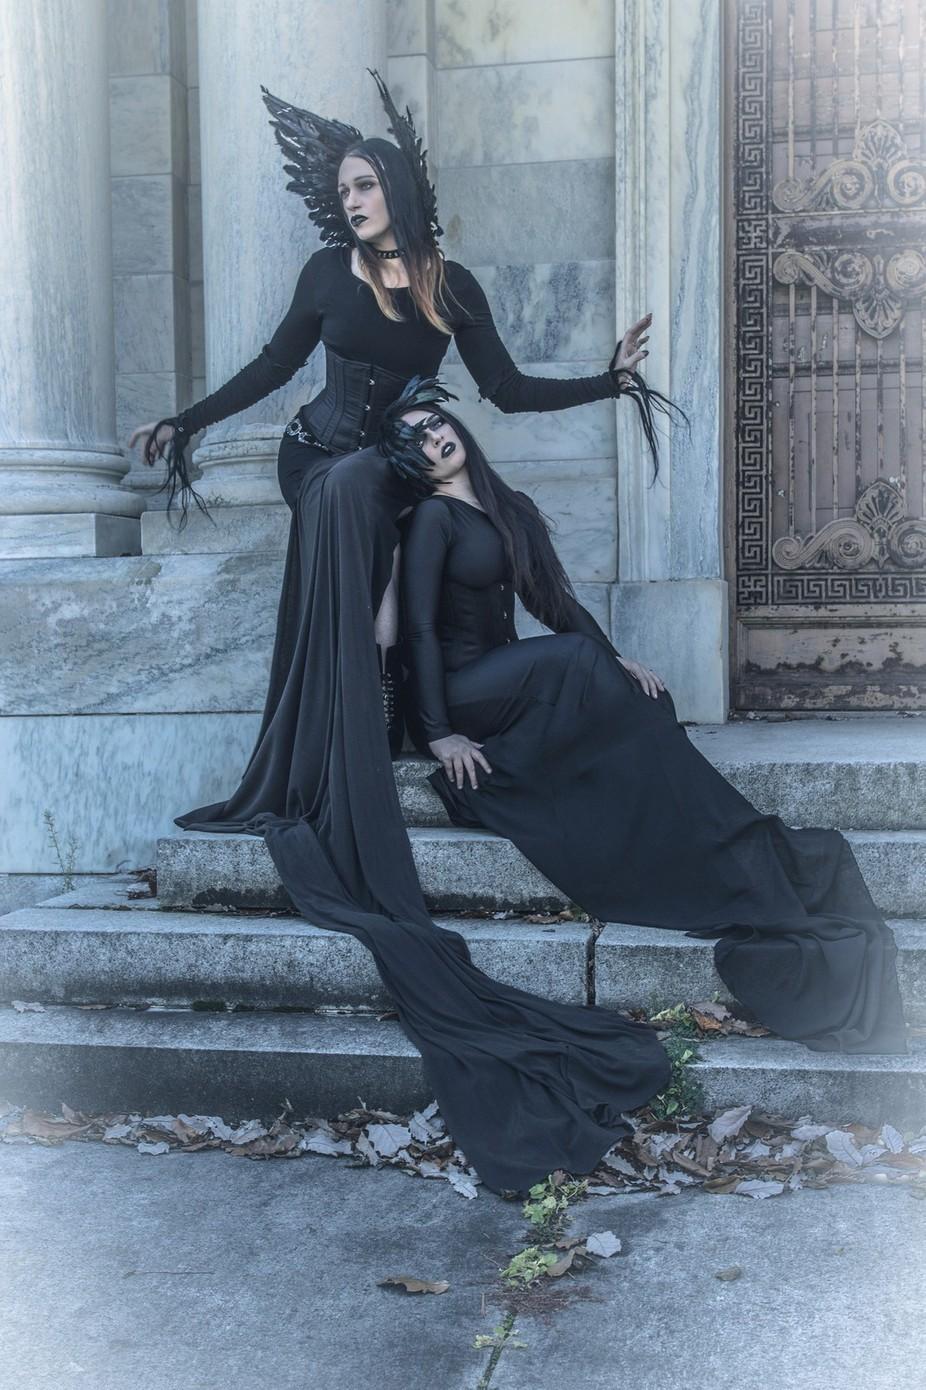 IMG_6325 by lauradark - Celebrating Fashion Photo Contest